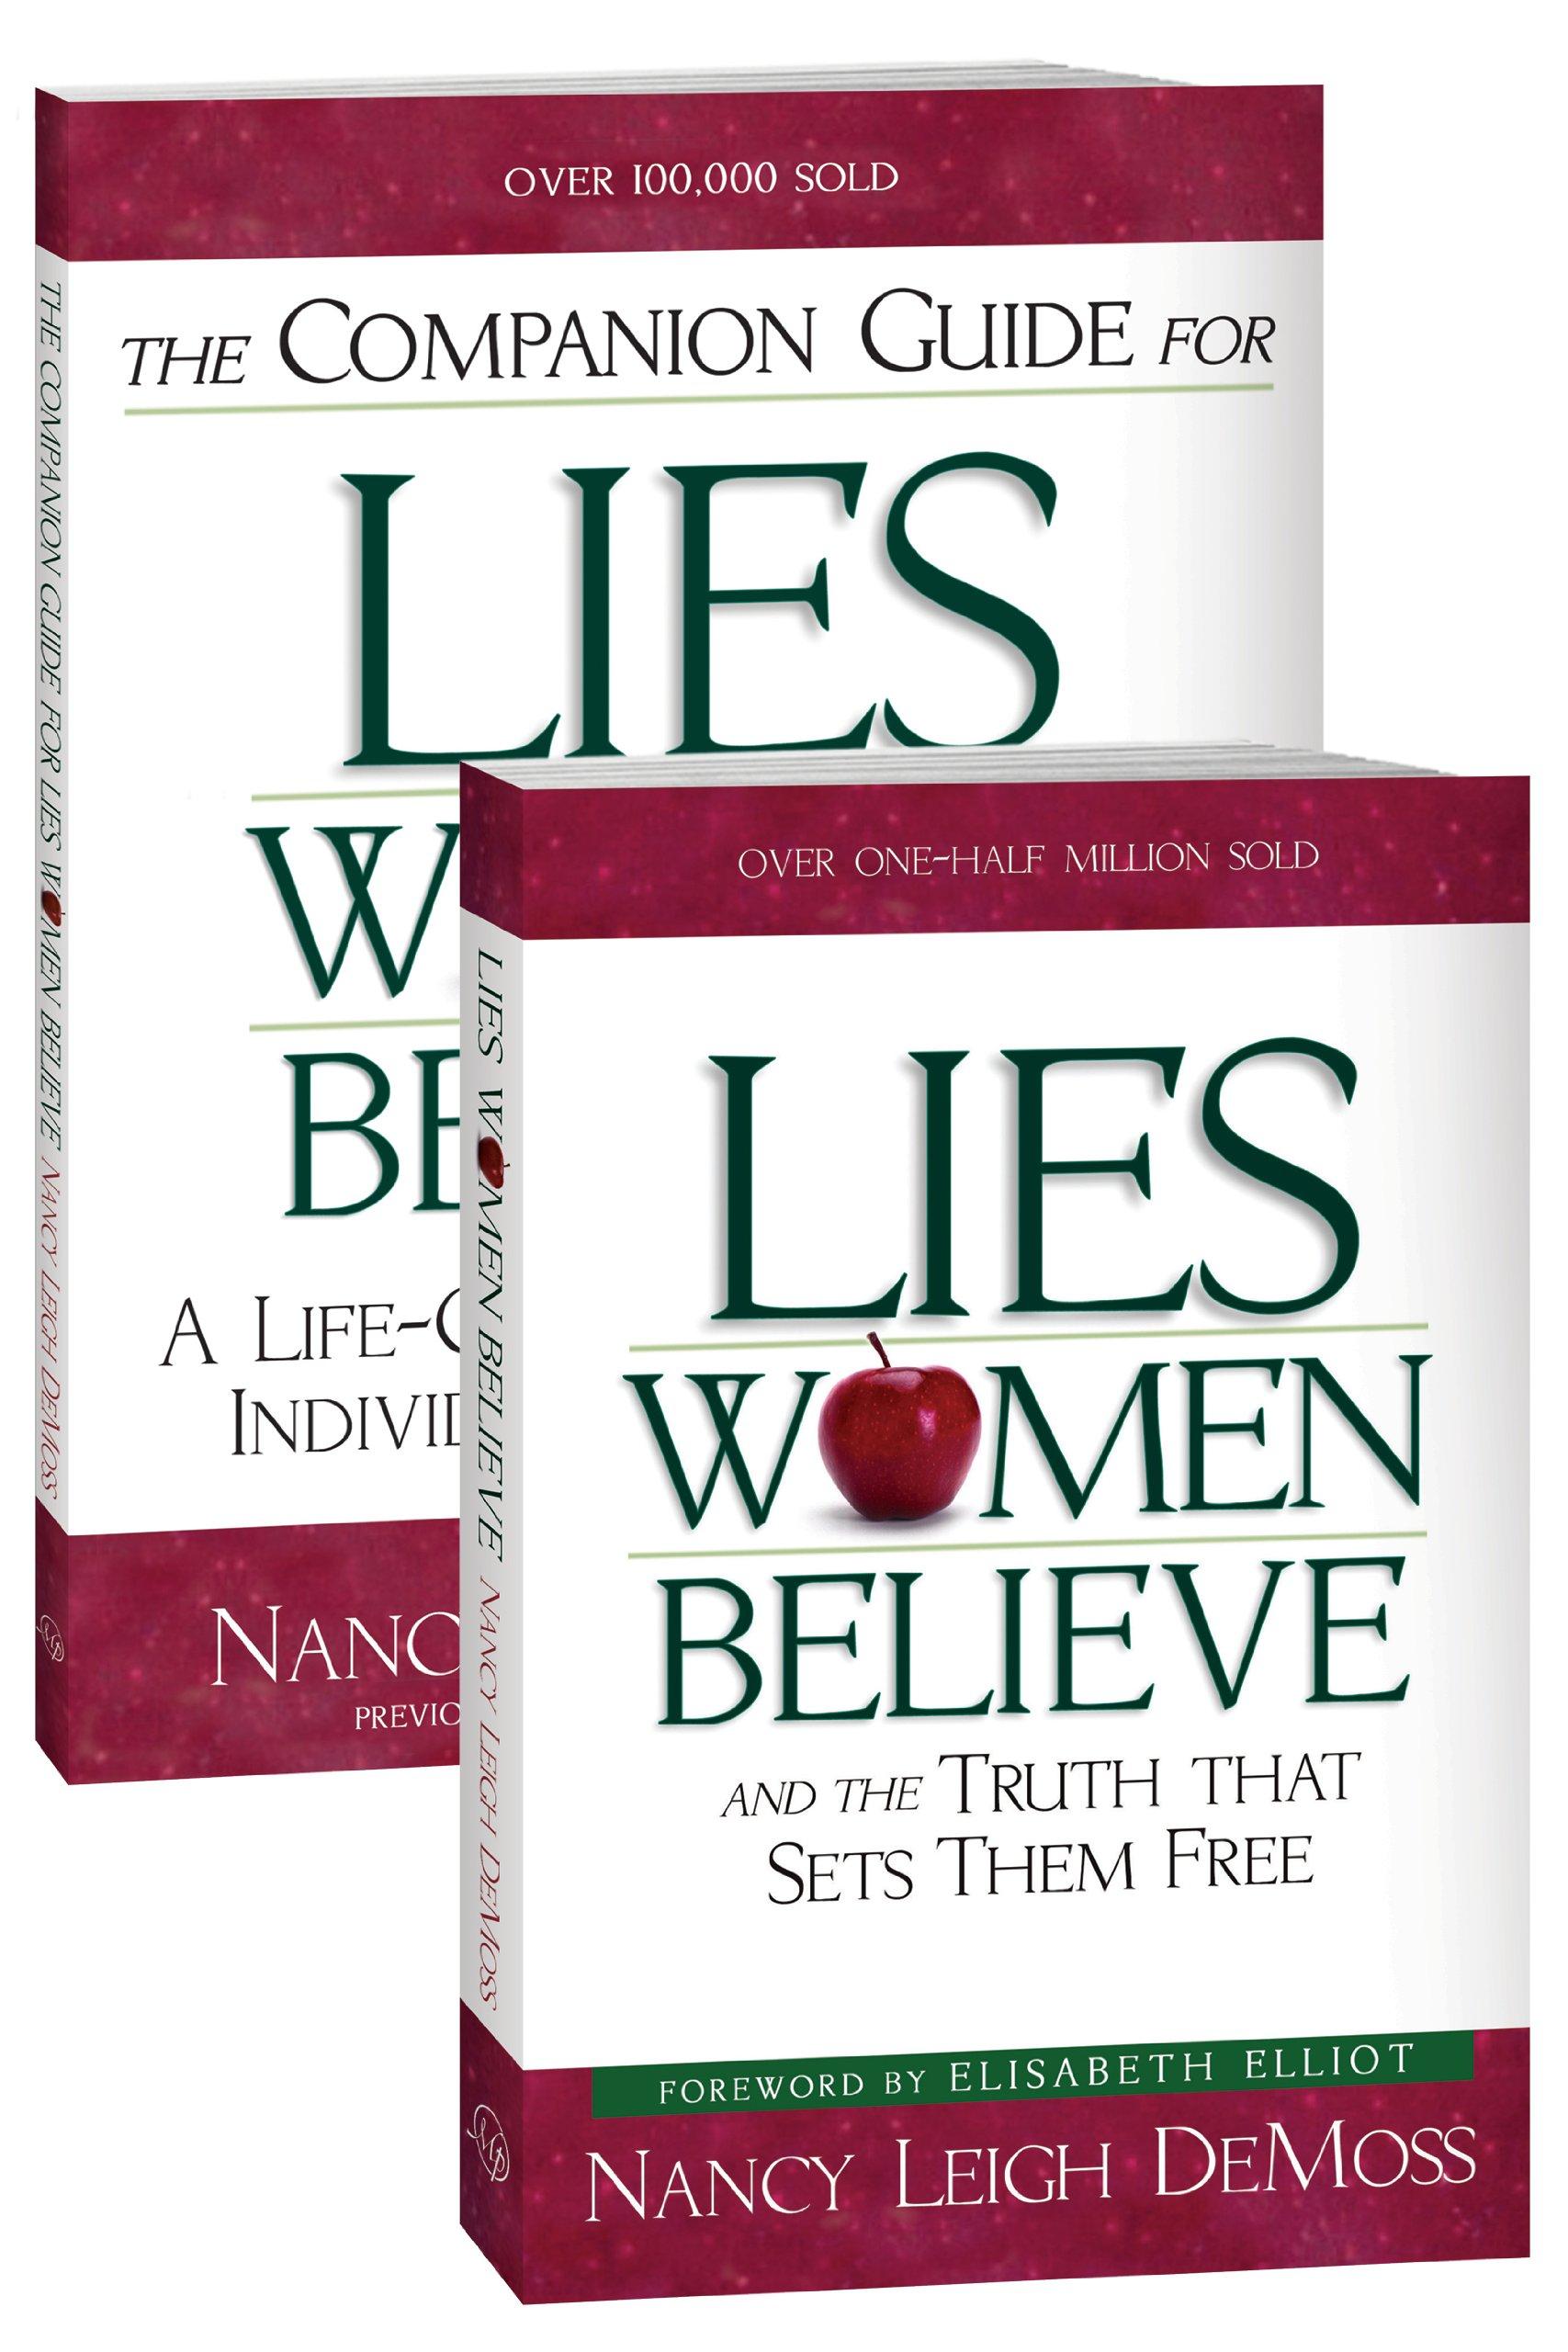 Download Lies Women Believe/Companion Guide for Lies Women Believe- 2 book set ebook